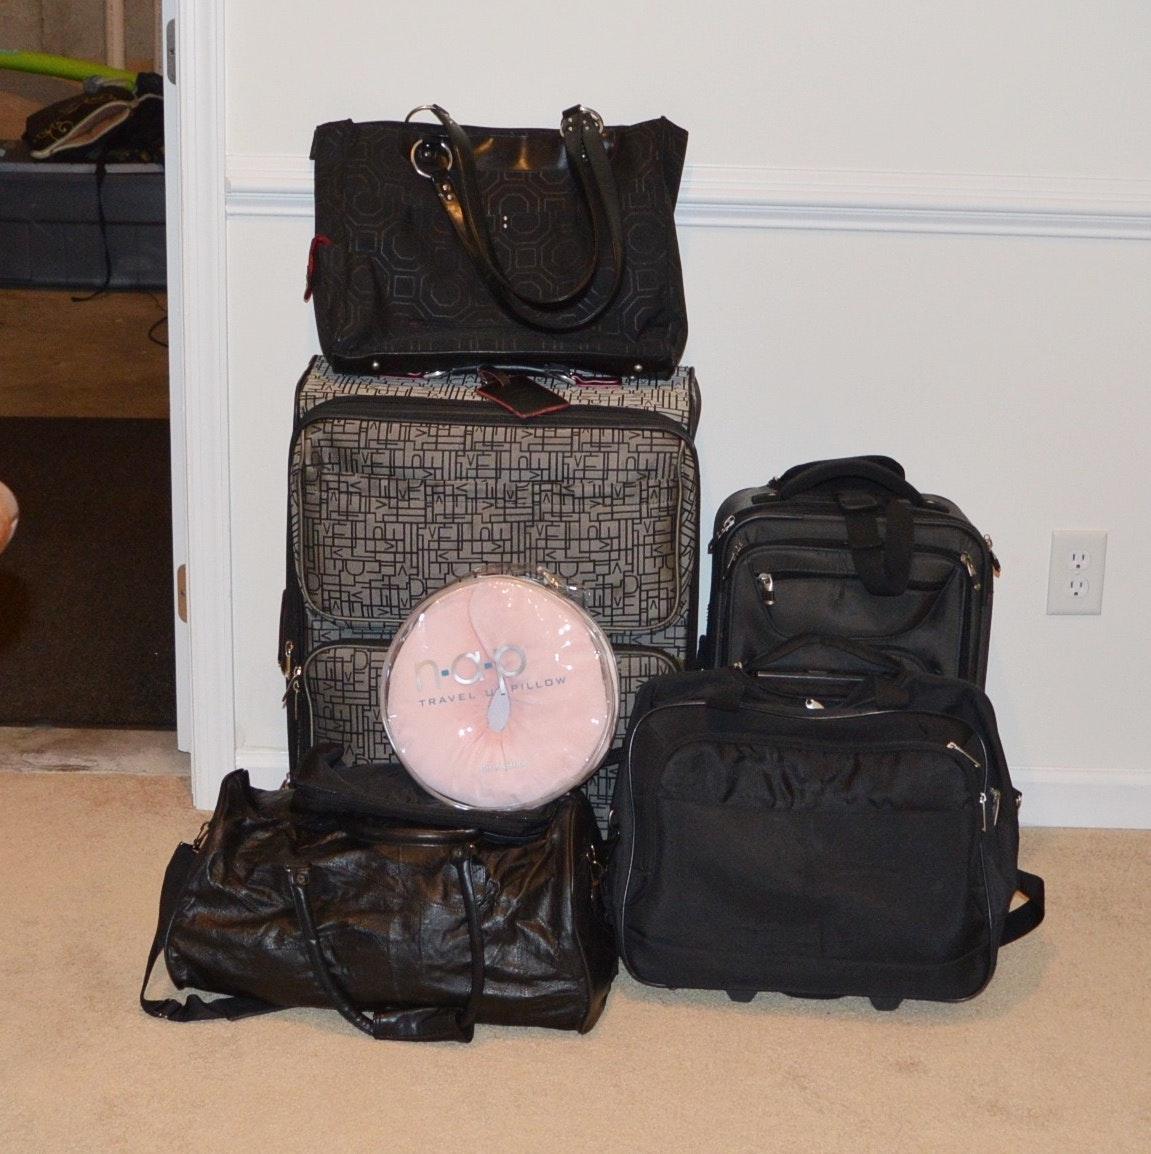 Diane Von Furstenberg for Randa Luggage Designed Case and More